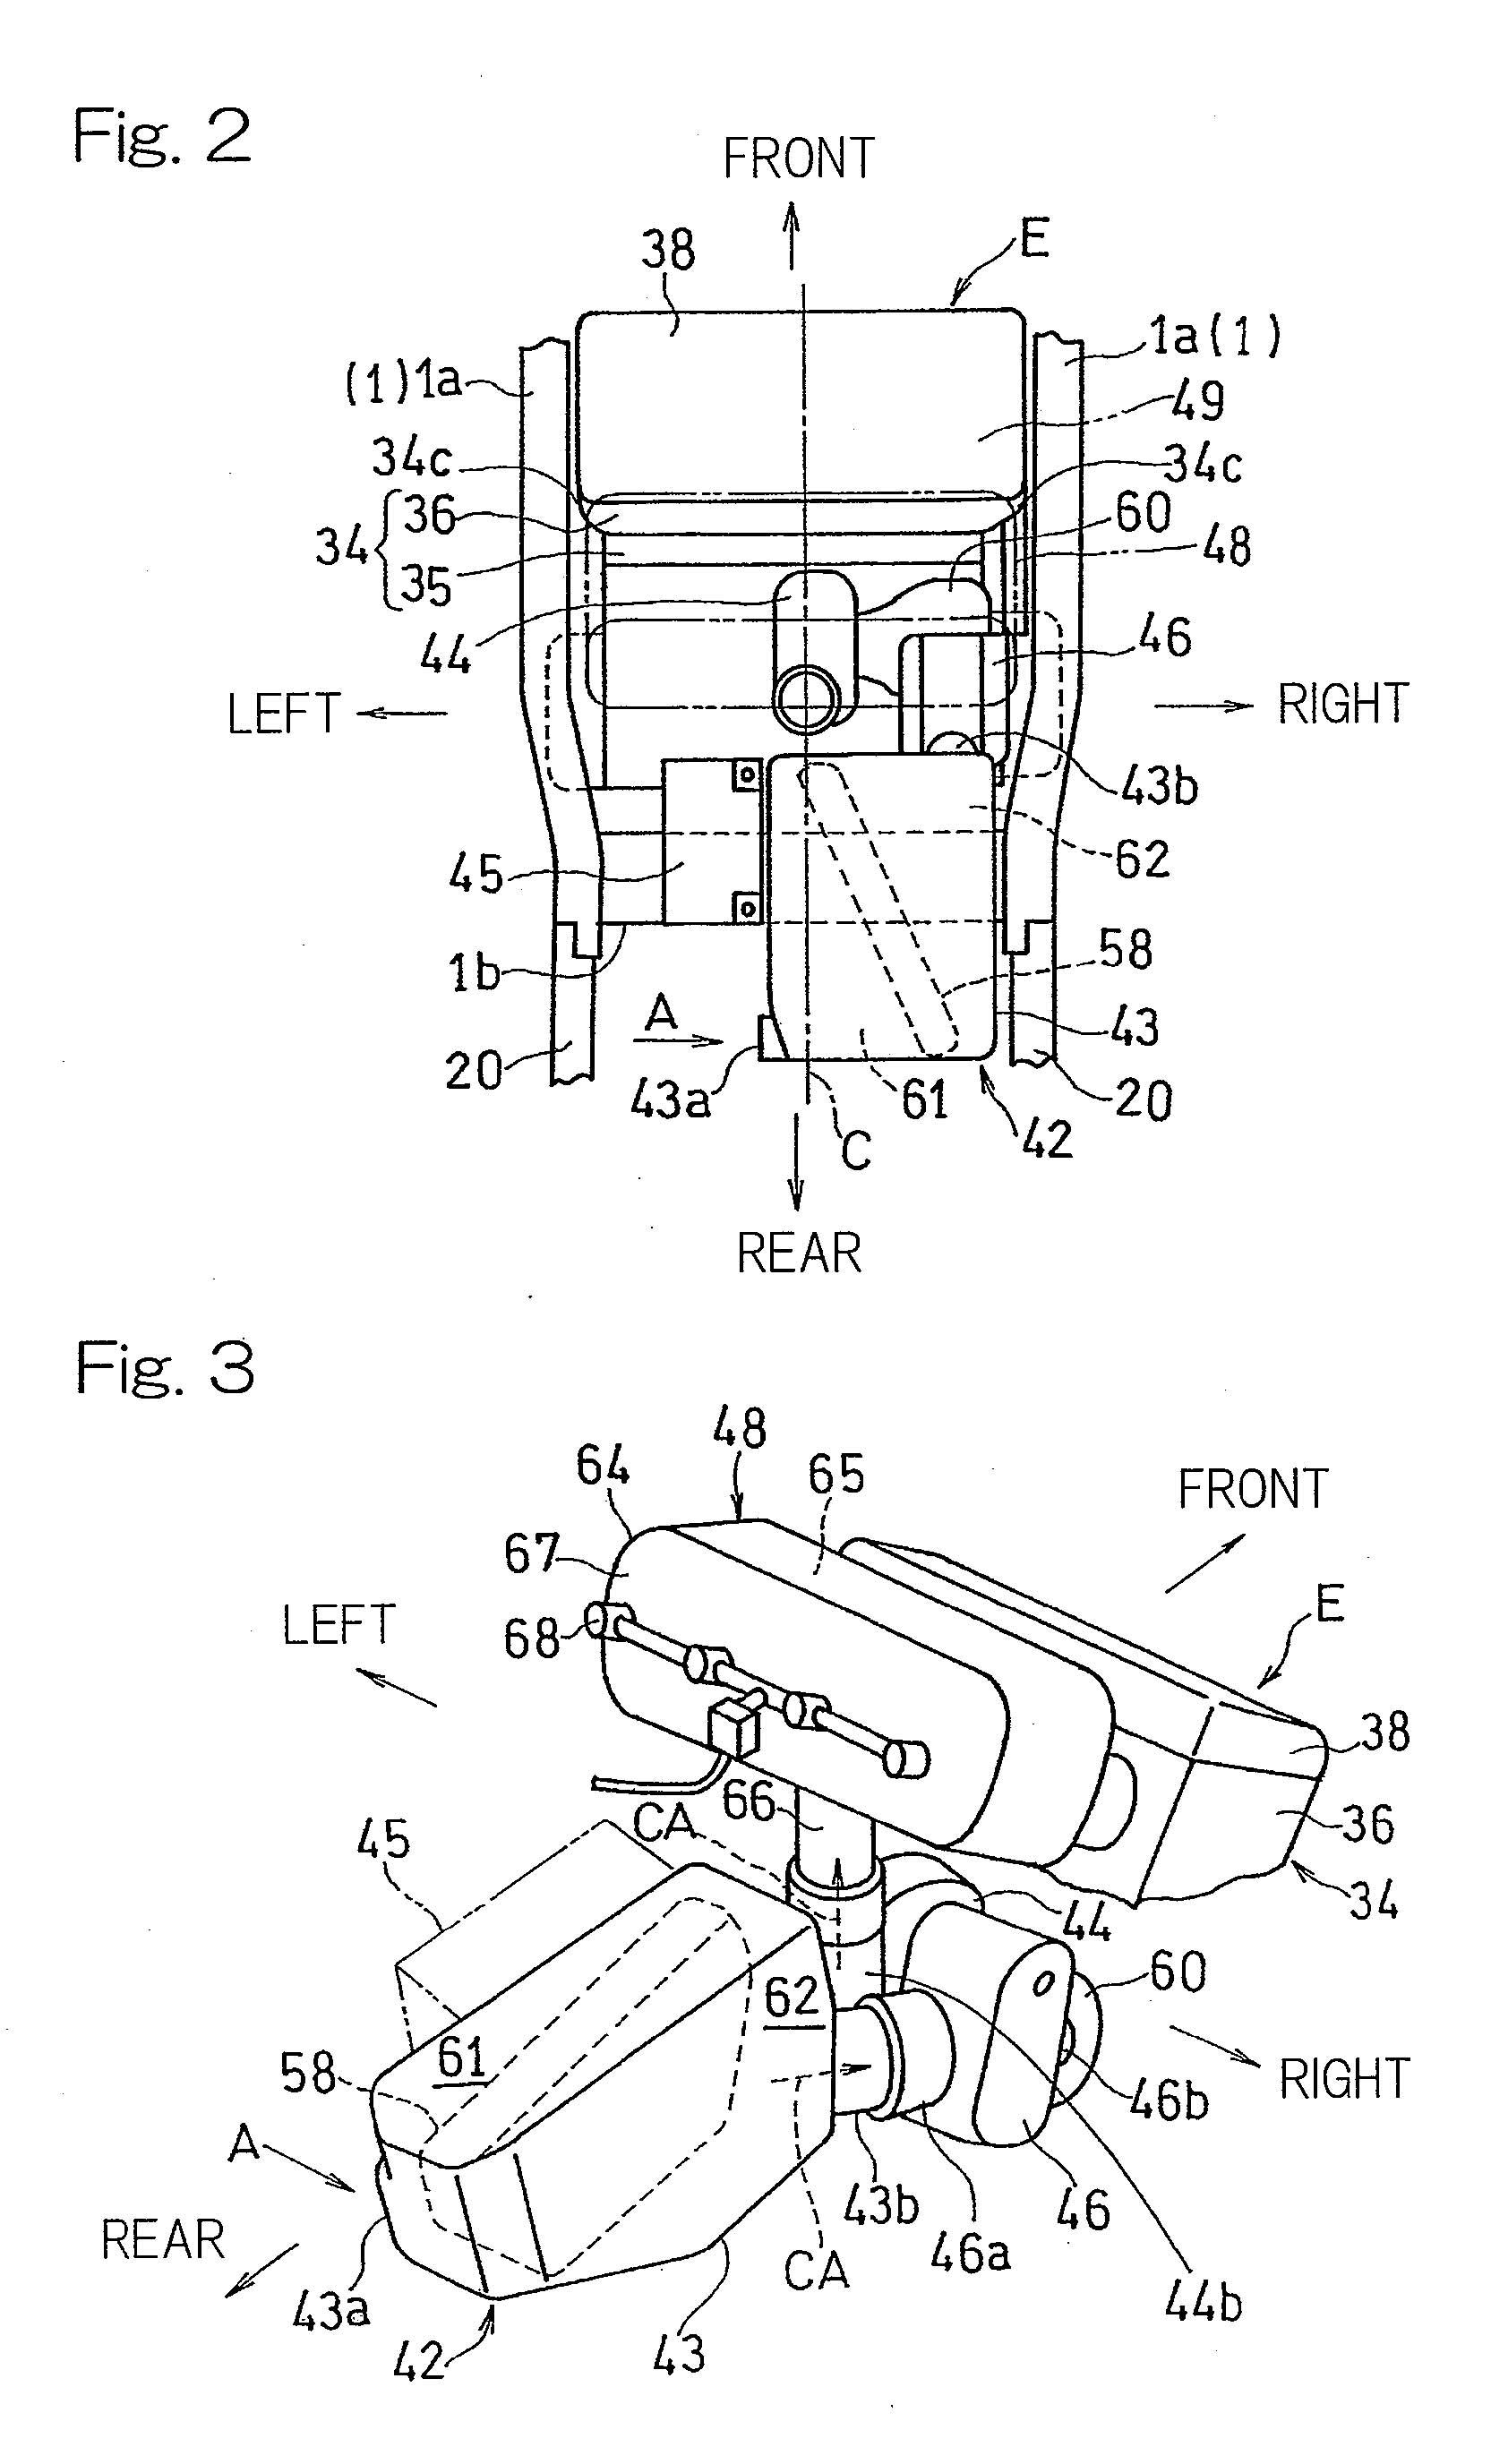 More On Kawasakis Supercharged Motorcycle Engine Asphalt Rubber Supercharger Diagram Kawasaki Patent Drawings 02